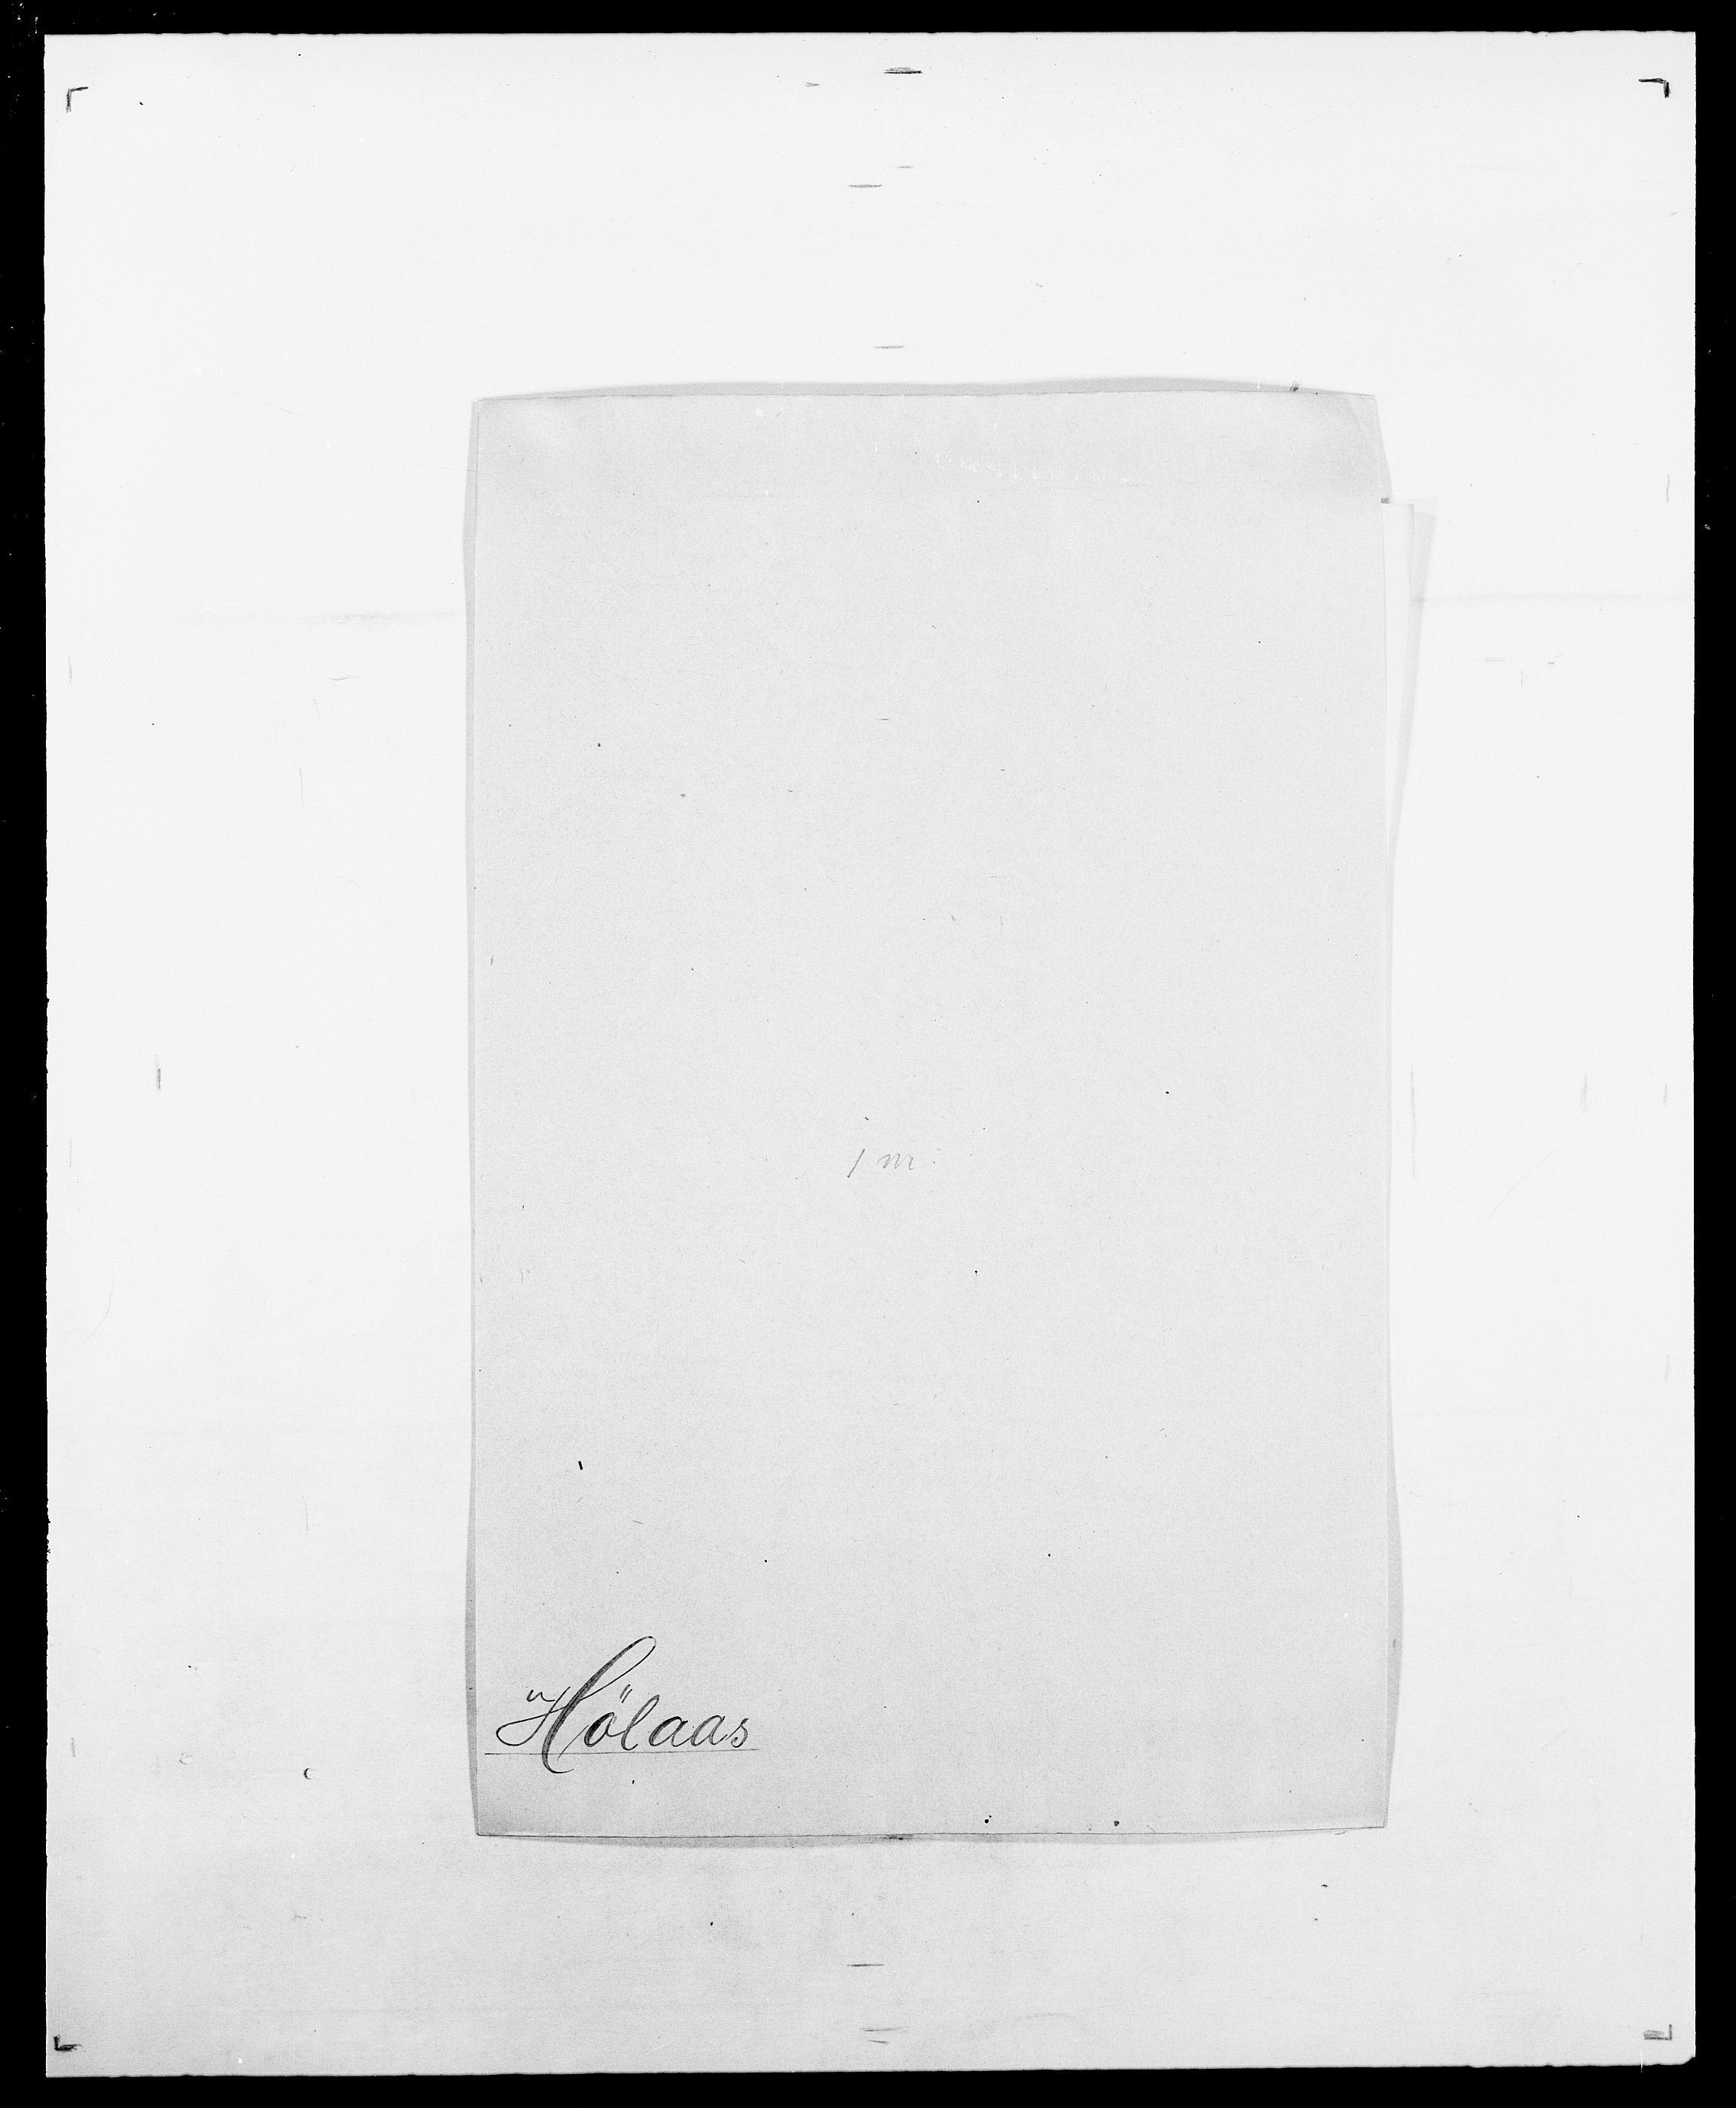 SAO, Delgobe, Charles Antoine - samling, D/Da/L0019: van der Hude - Joys, s. 356